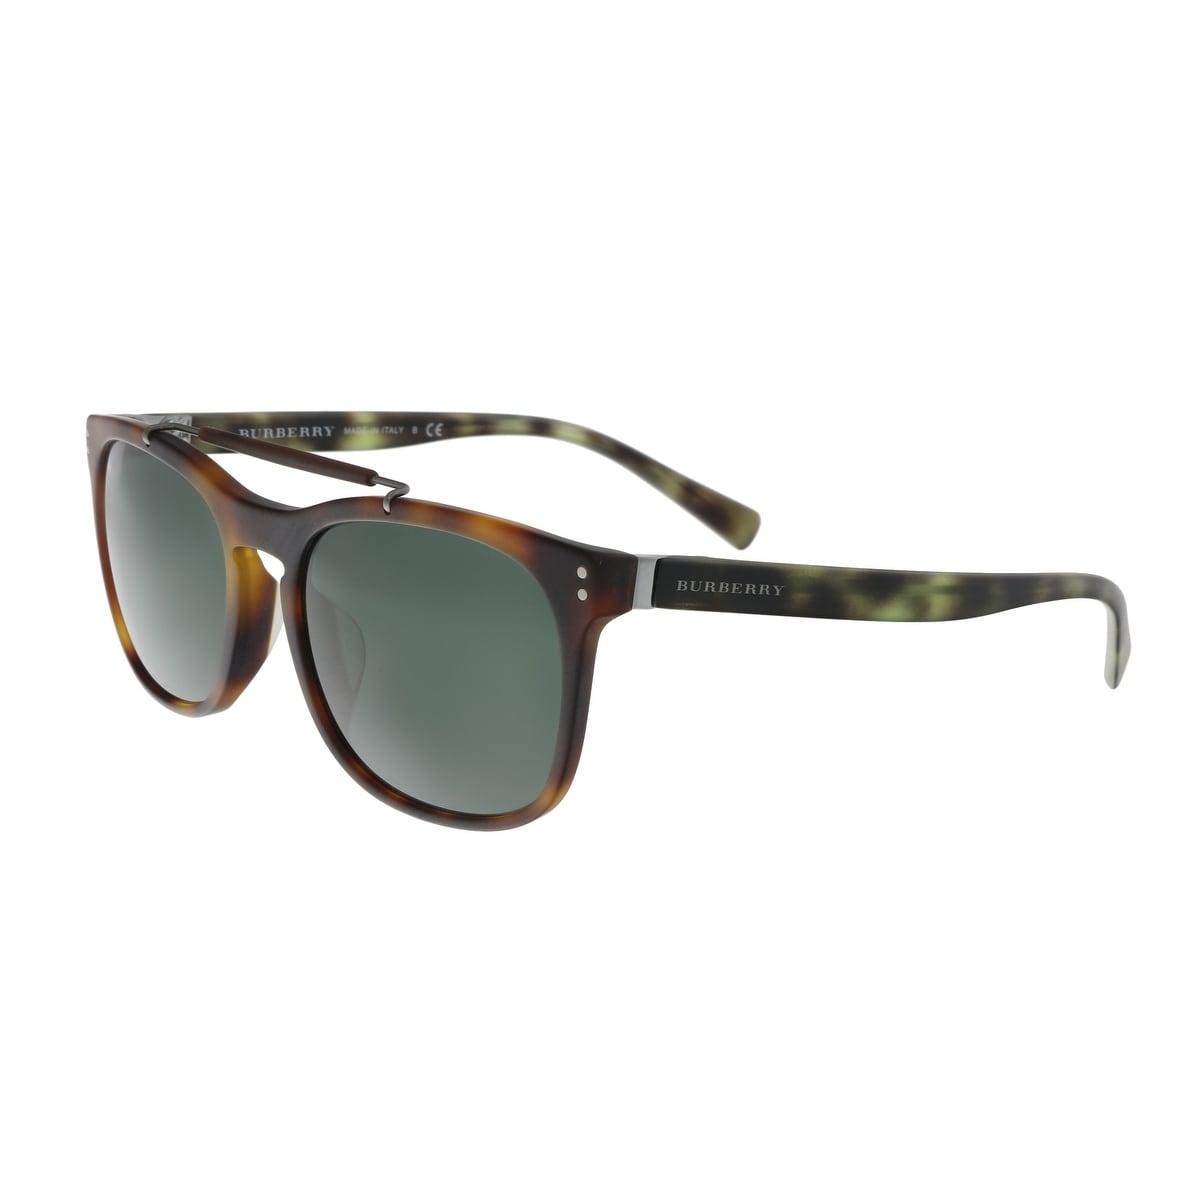 7a0410739c7e0 Burberry BE4244F 362271 Matte Light Havana Rectangular Sunglasses - no size